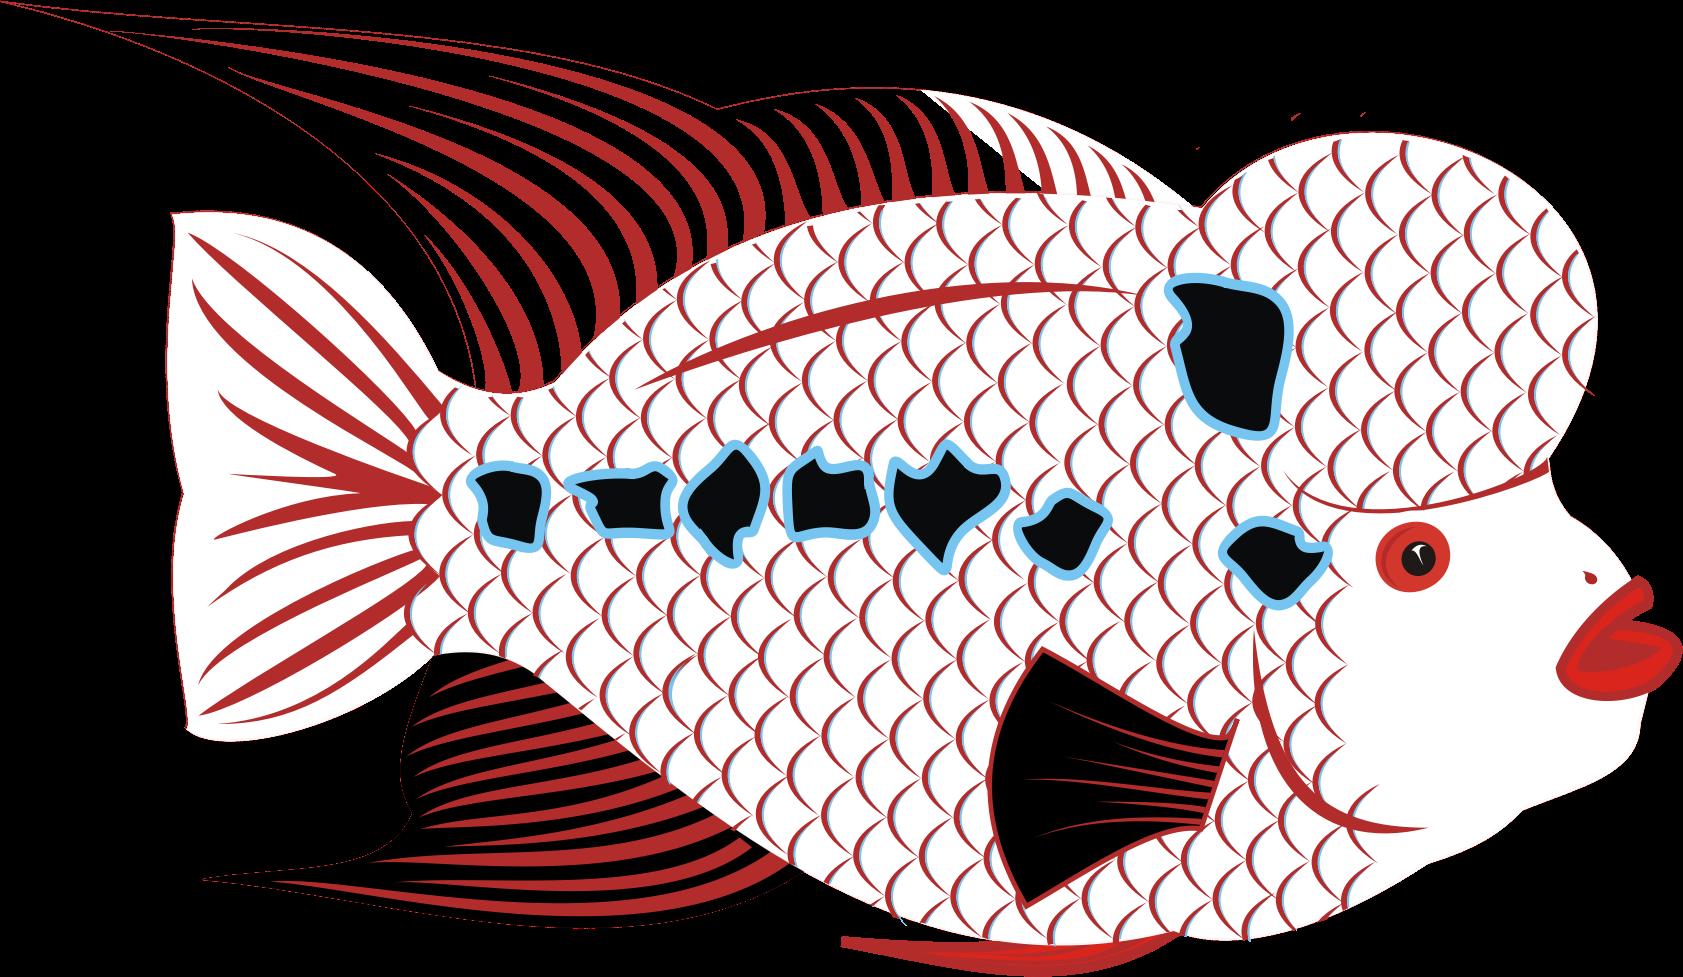 Big image png. Goldfish clipart fish head